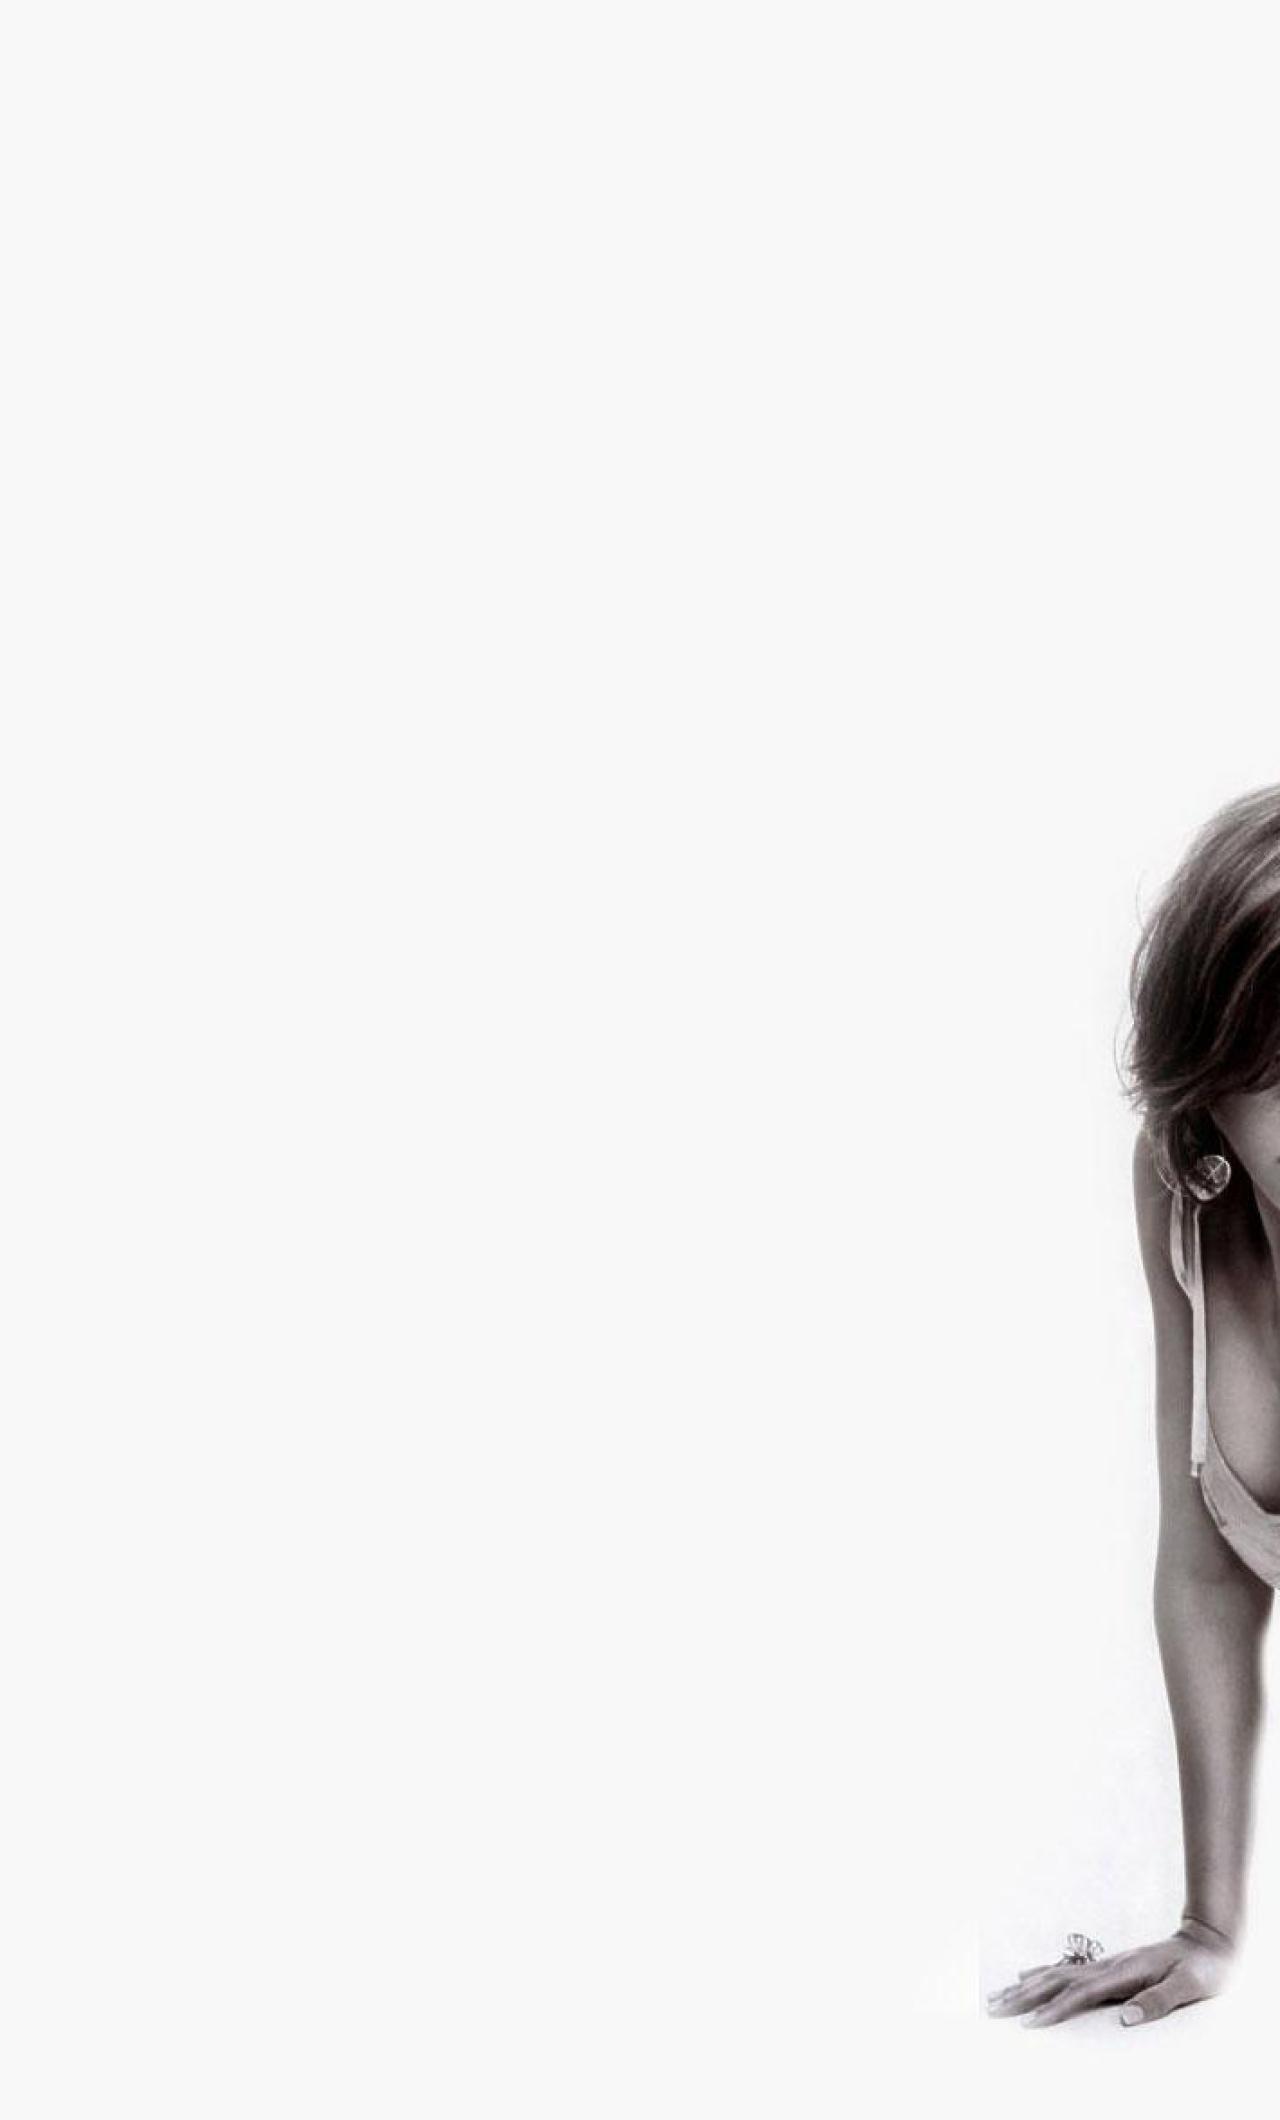 Jessica Alba Hot Cleavage Wallappers Full HD Wallpaper